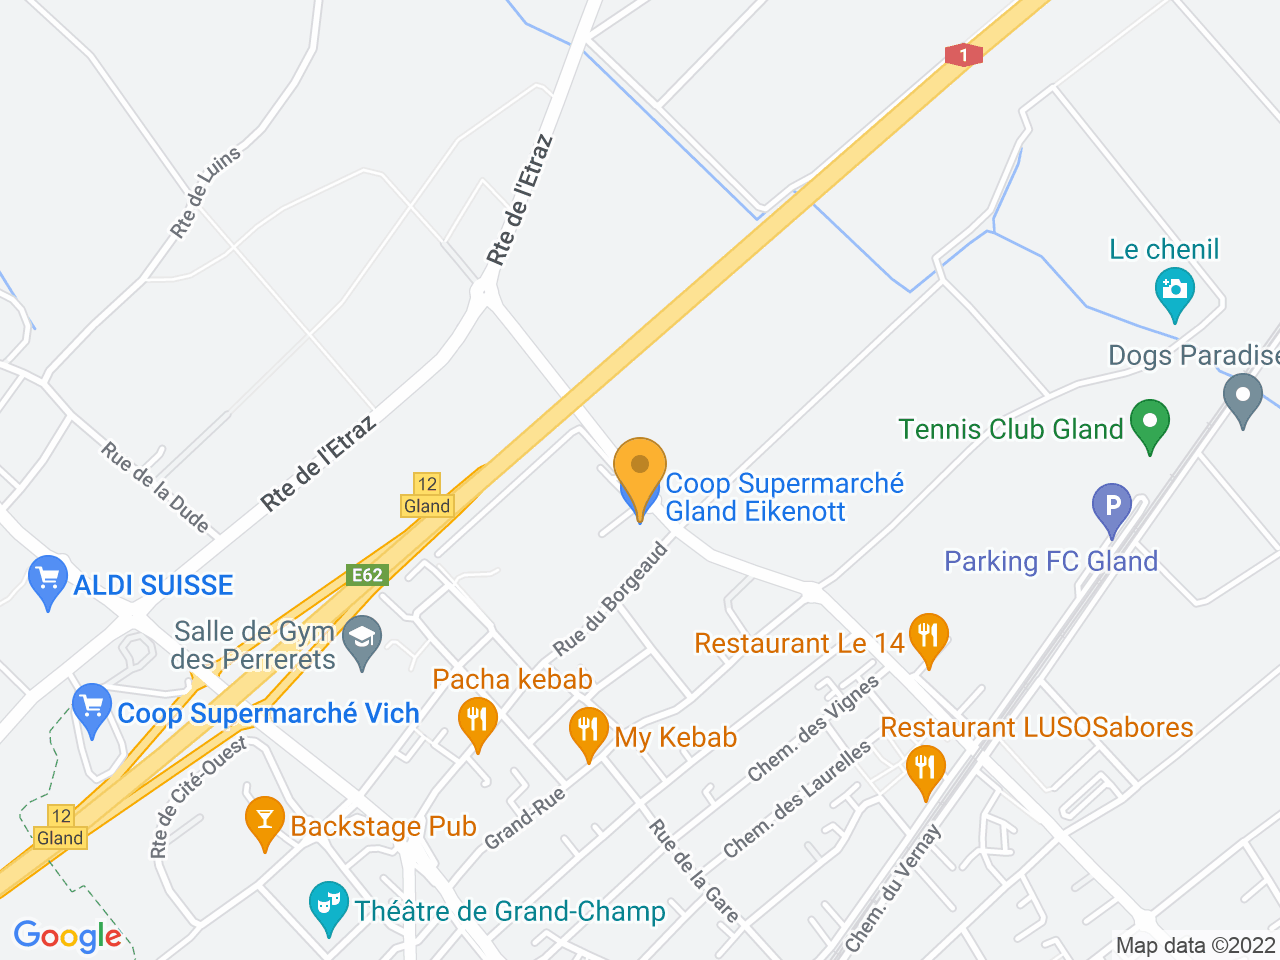 Allée du Communet 20, 1196 Gland